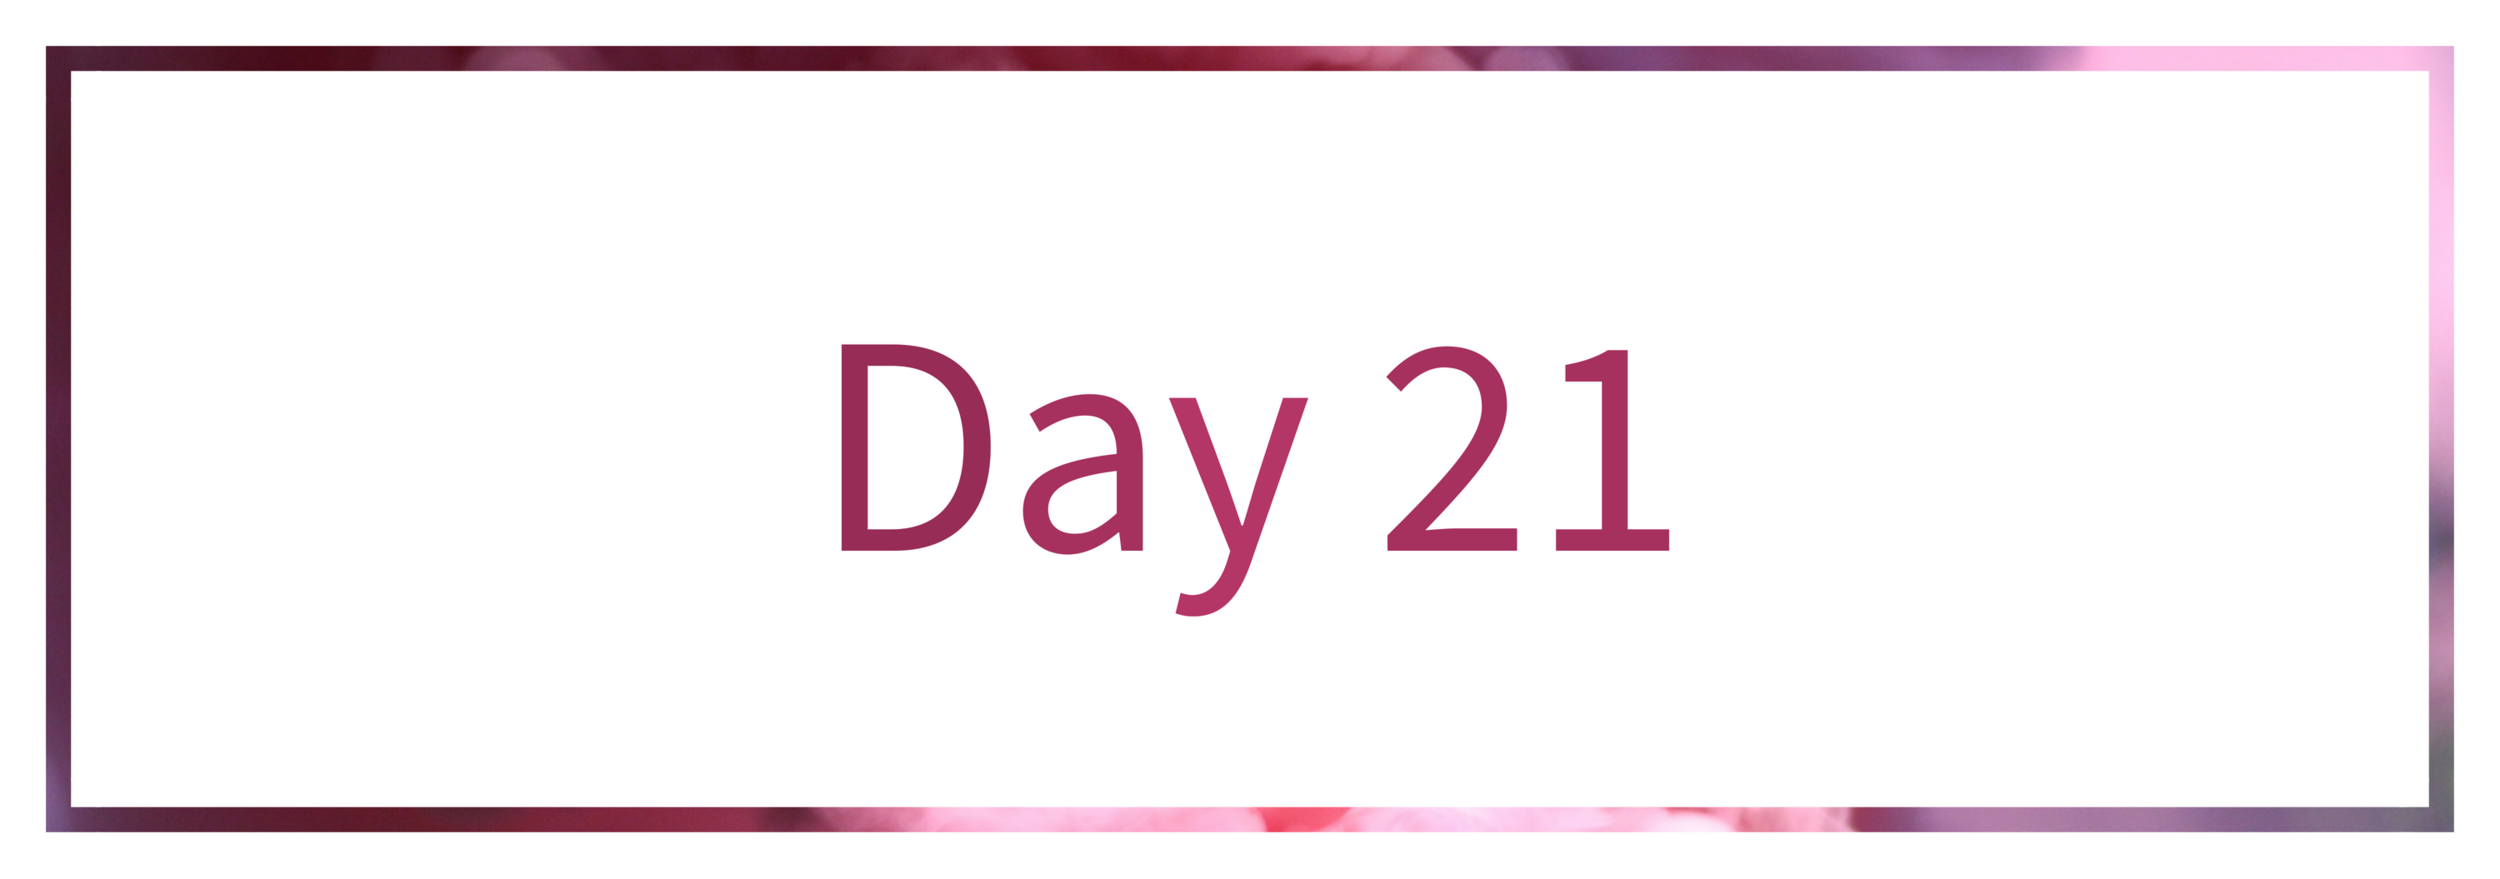 Goddess Day 21.png